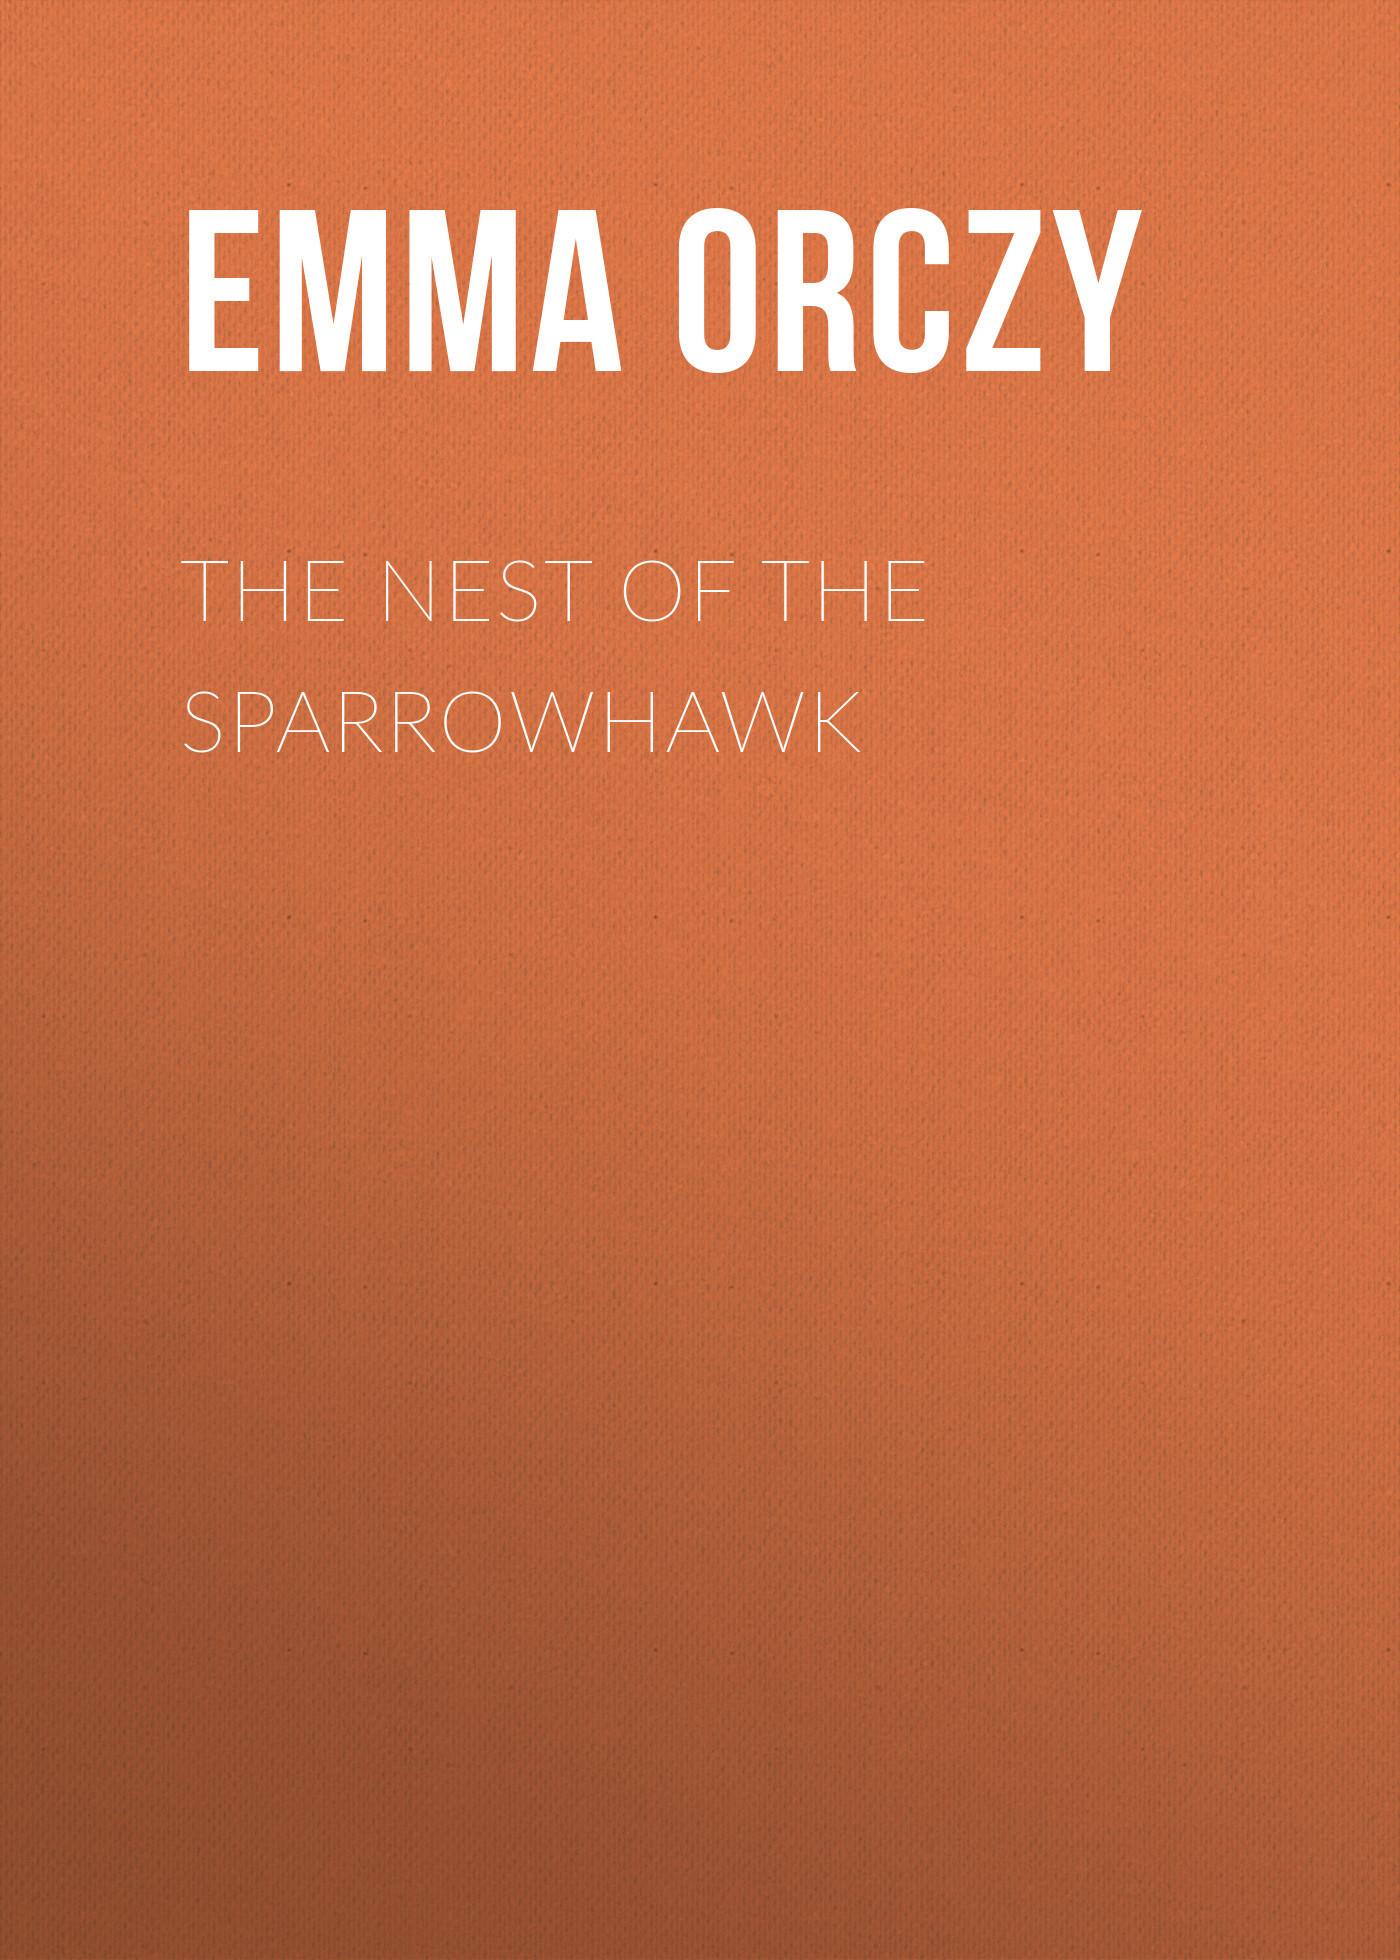 Emma Orczy The Nest of the Sparrowhawk красное боди emma xxl 3xl